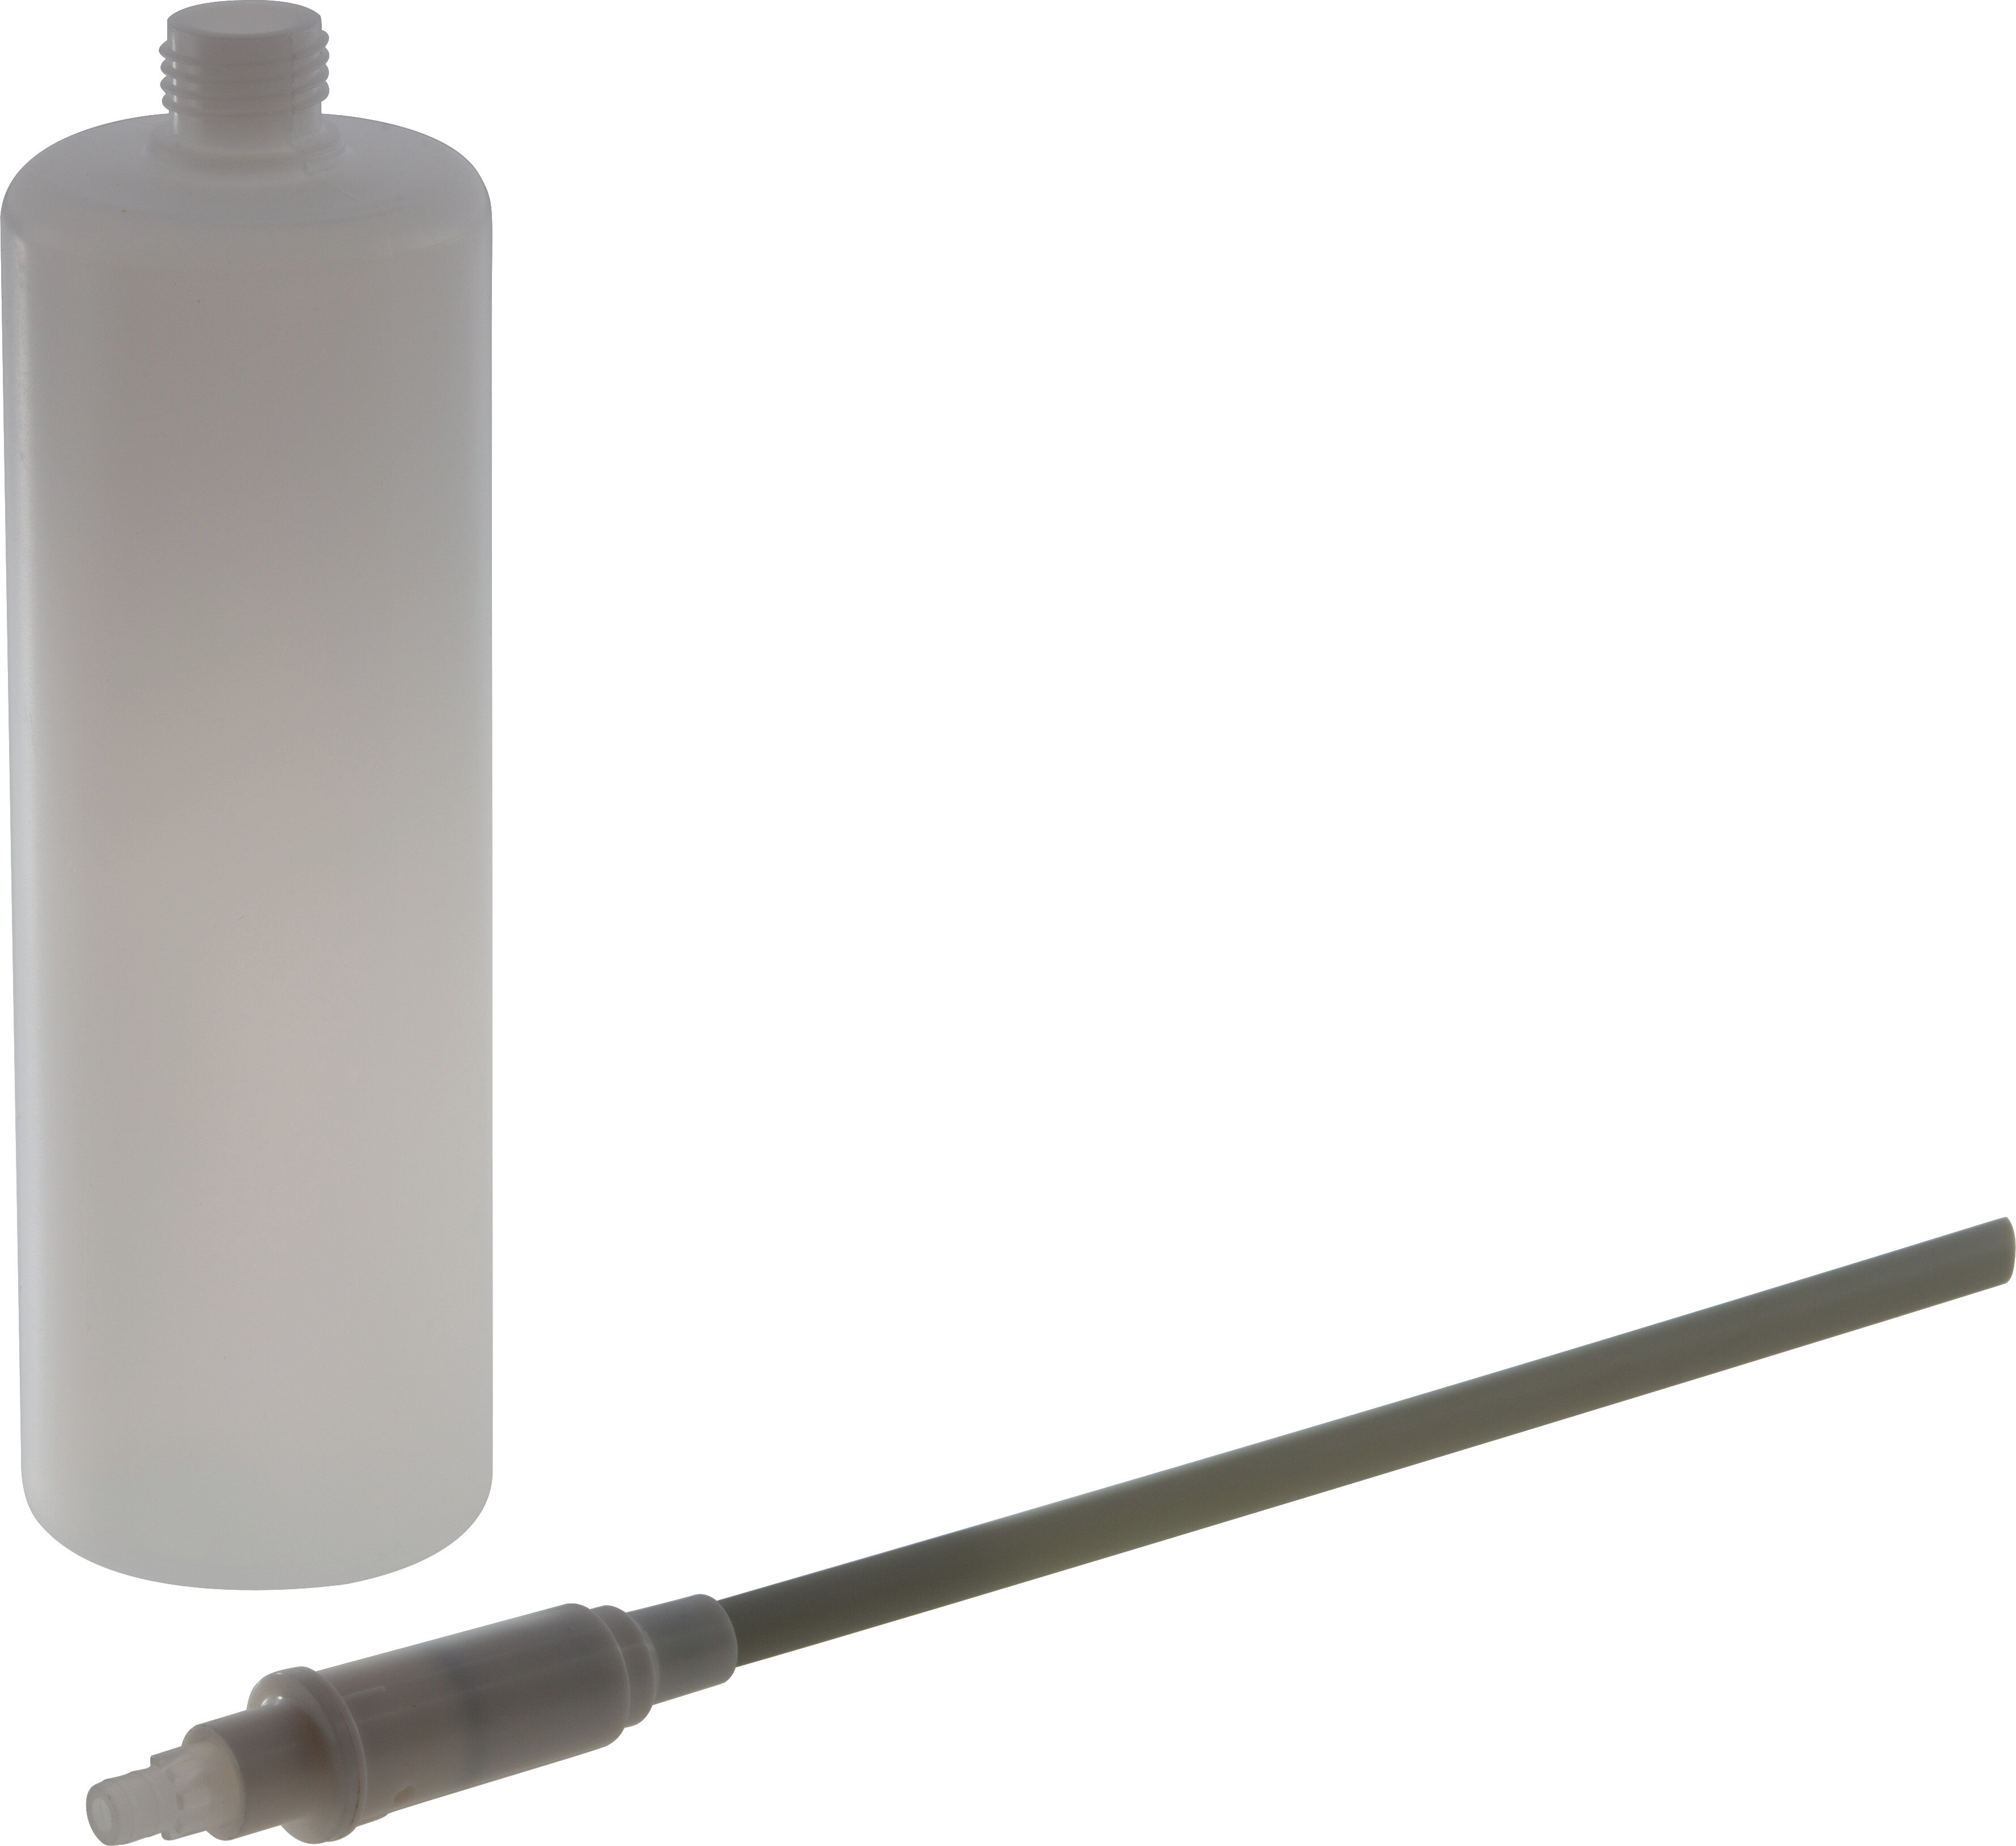 Rp47888 Delta Allora Soap Dispenser Reviews Wayfair